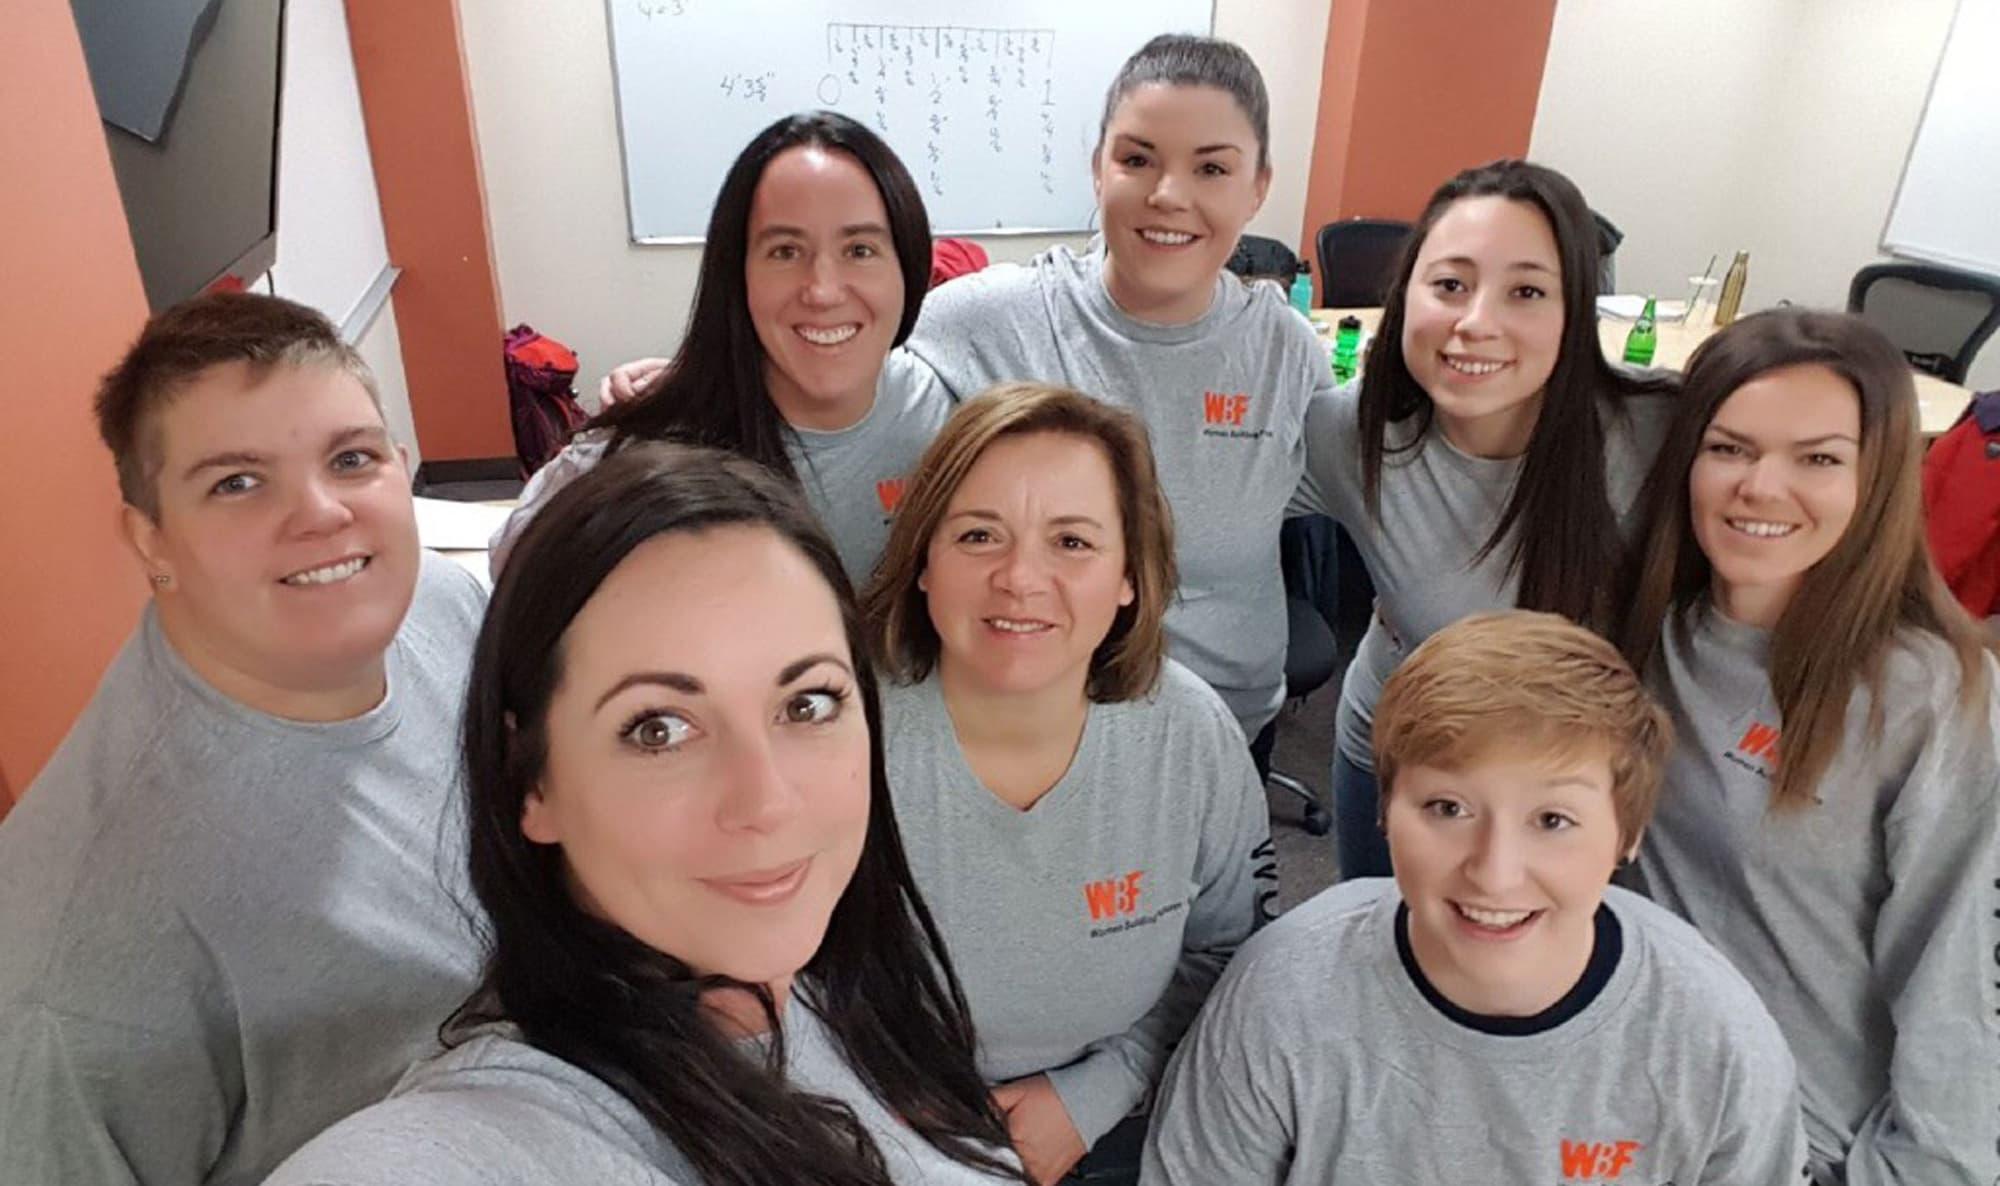 15 ans de partenariat avec l'organisme Women Building Futures